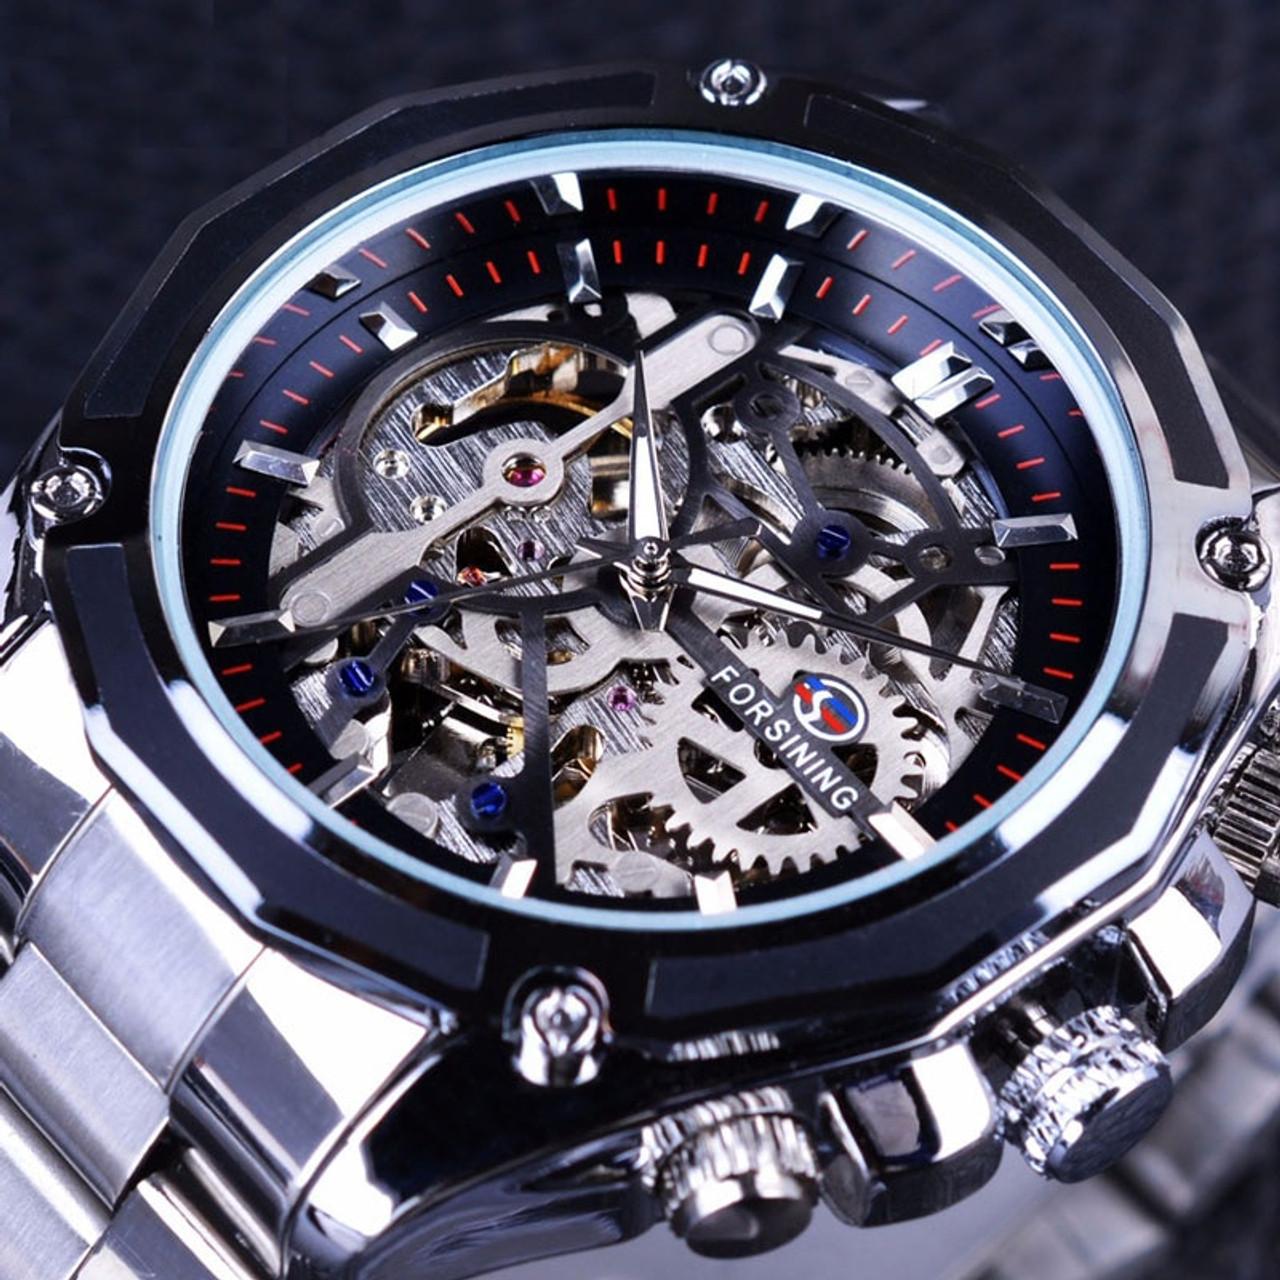 a01f6e9e4b8 ... Gold Watches Men Automatic Mechanical Skeleton Watch Men Steel  Wristwatch Male Clock Relogio Masculino ...